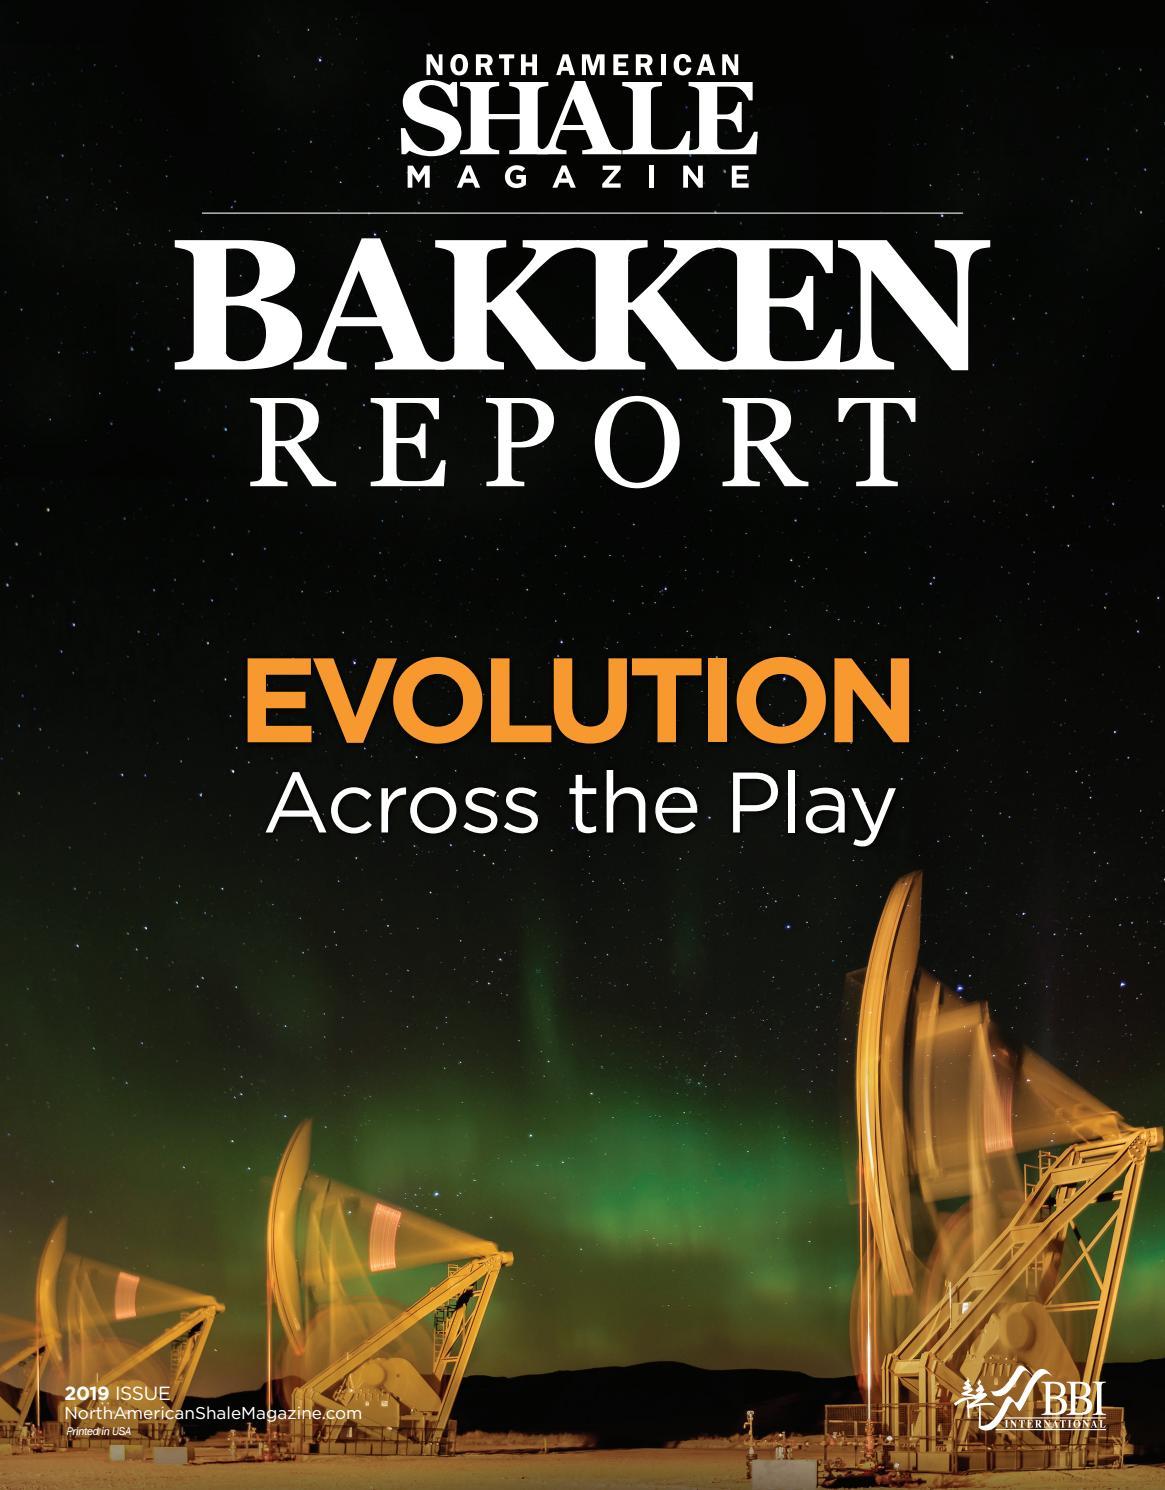 North American Shale Magazine 2019 Bakken Report by BBI